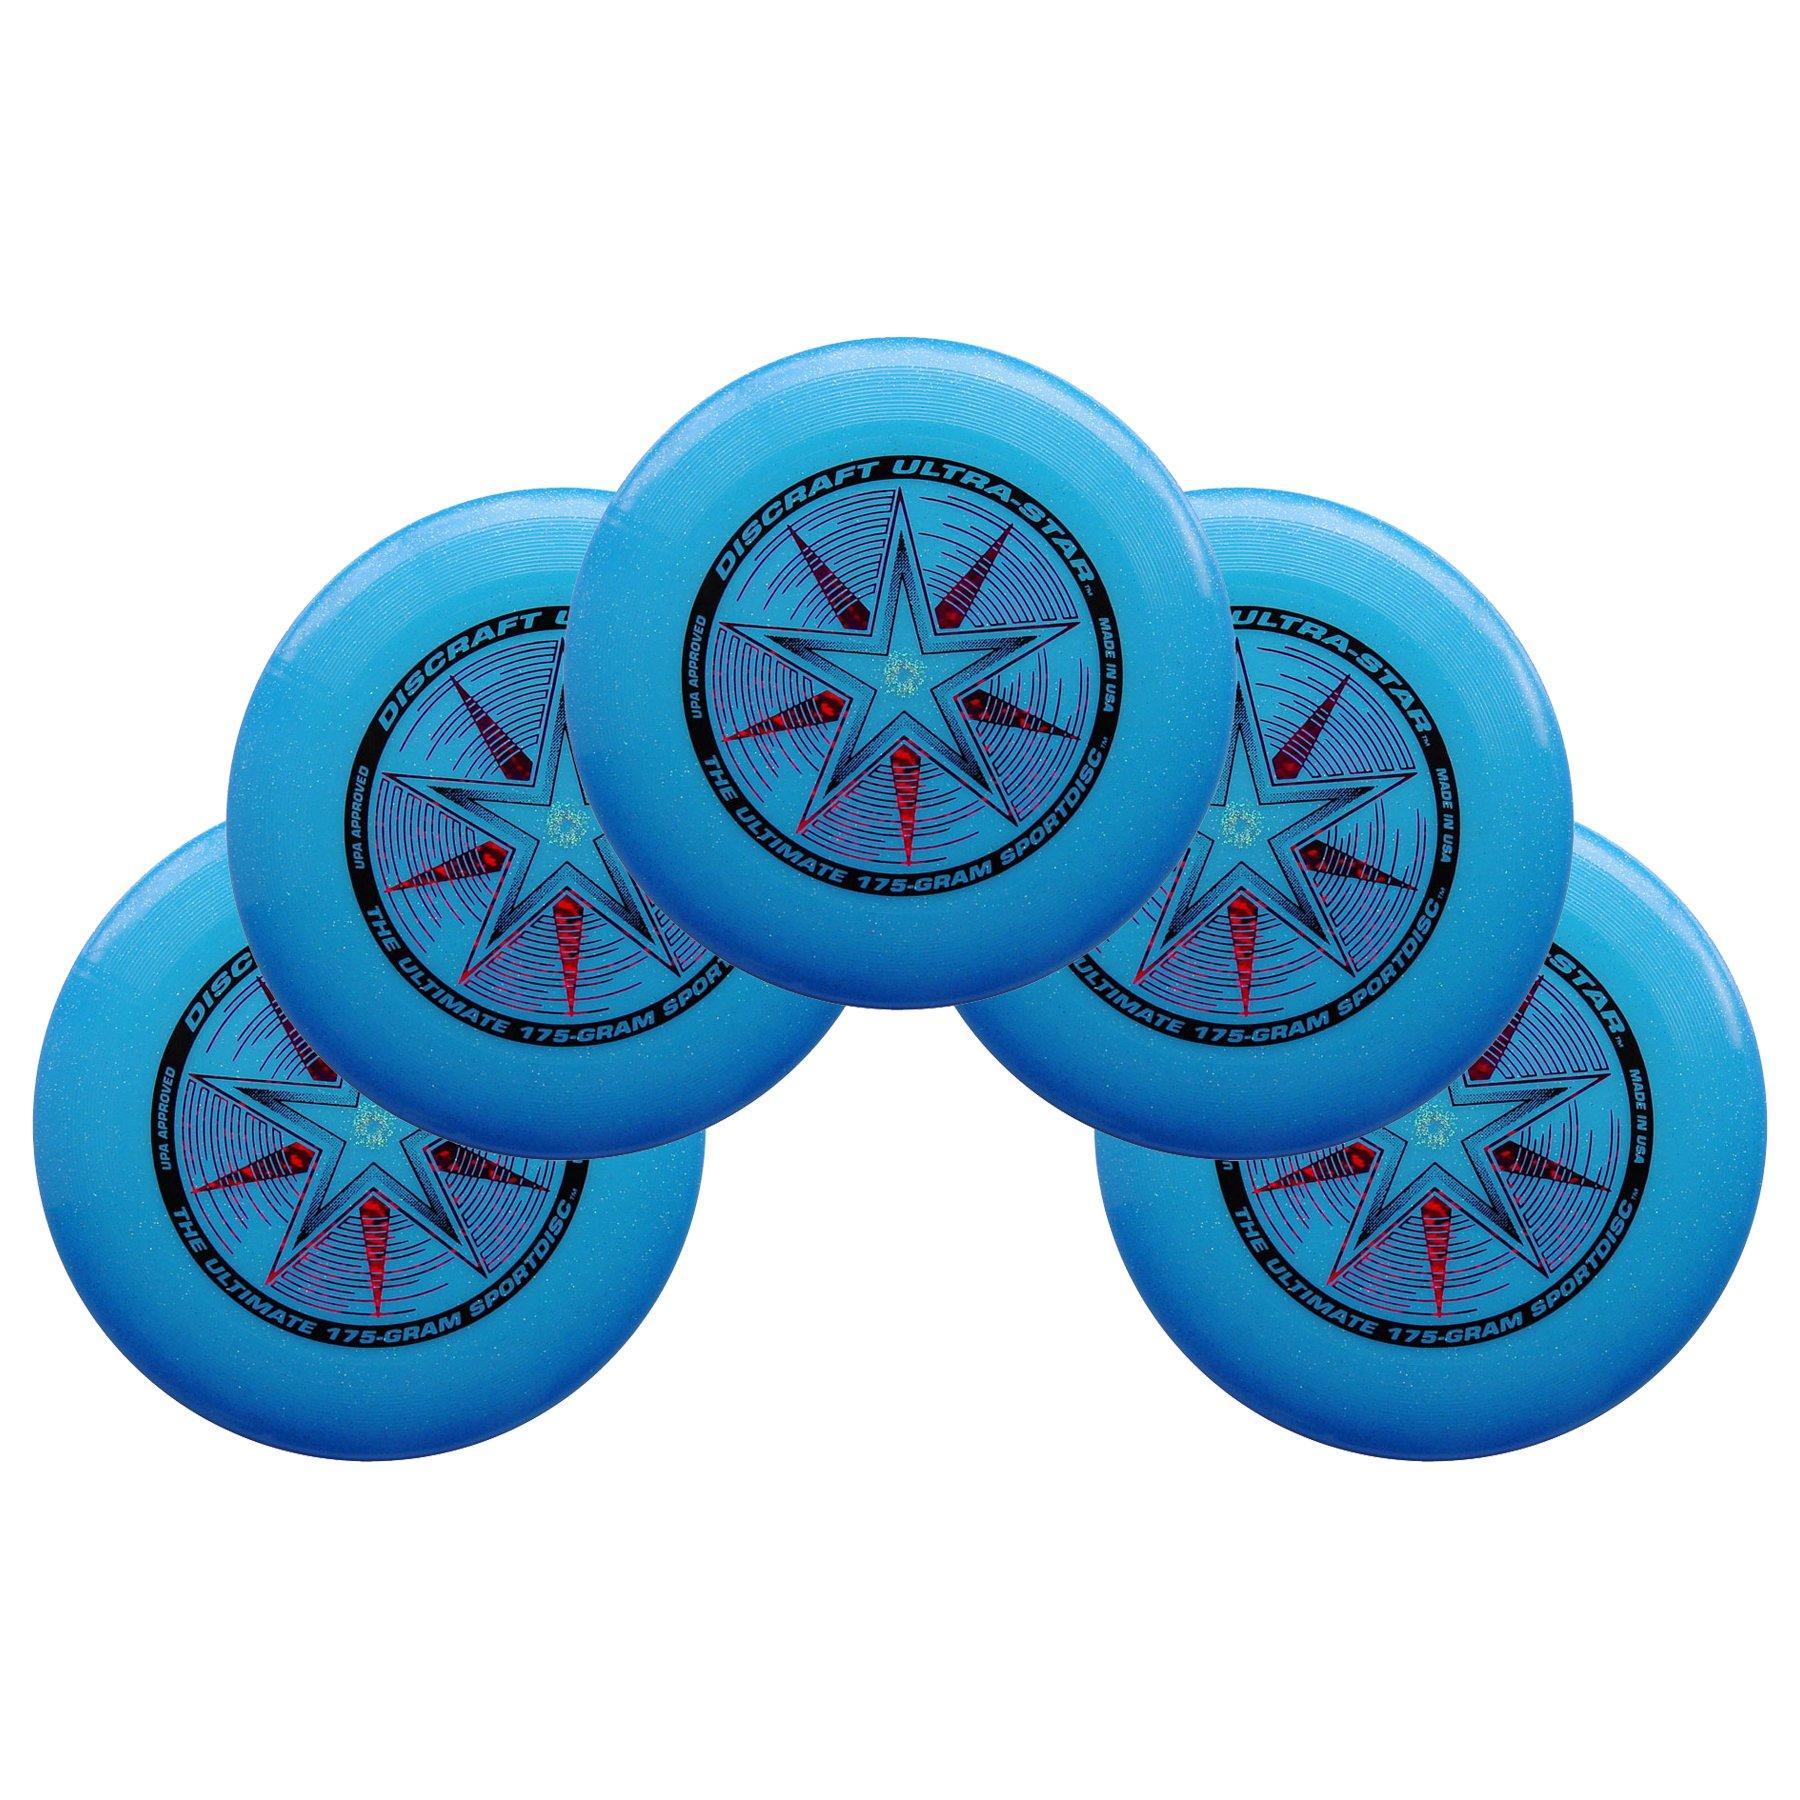 Discraft Ultra-Star 175g Ultimate Sportdisc Blue Sparkle (5 Pack) by Discraft